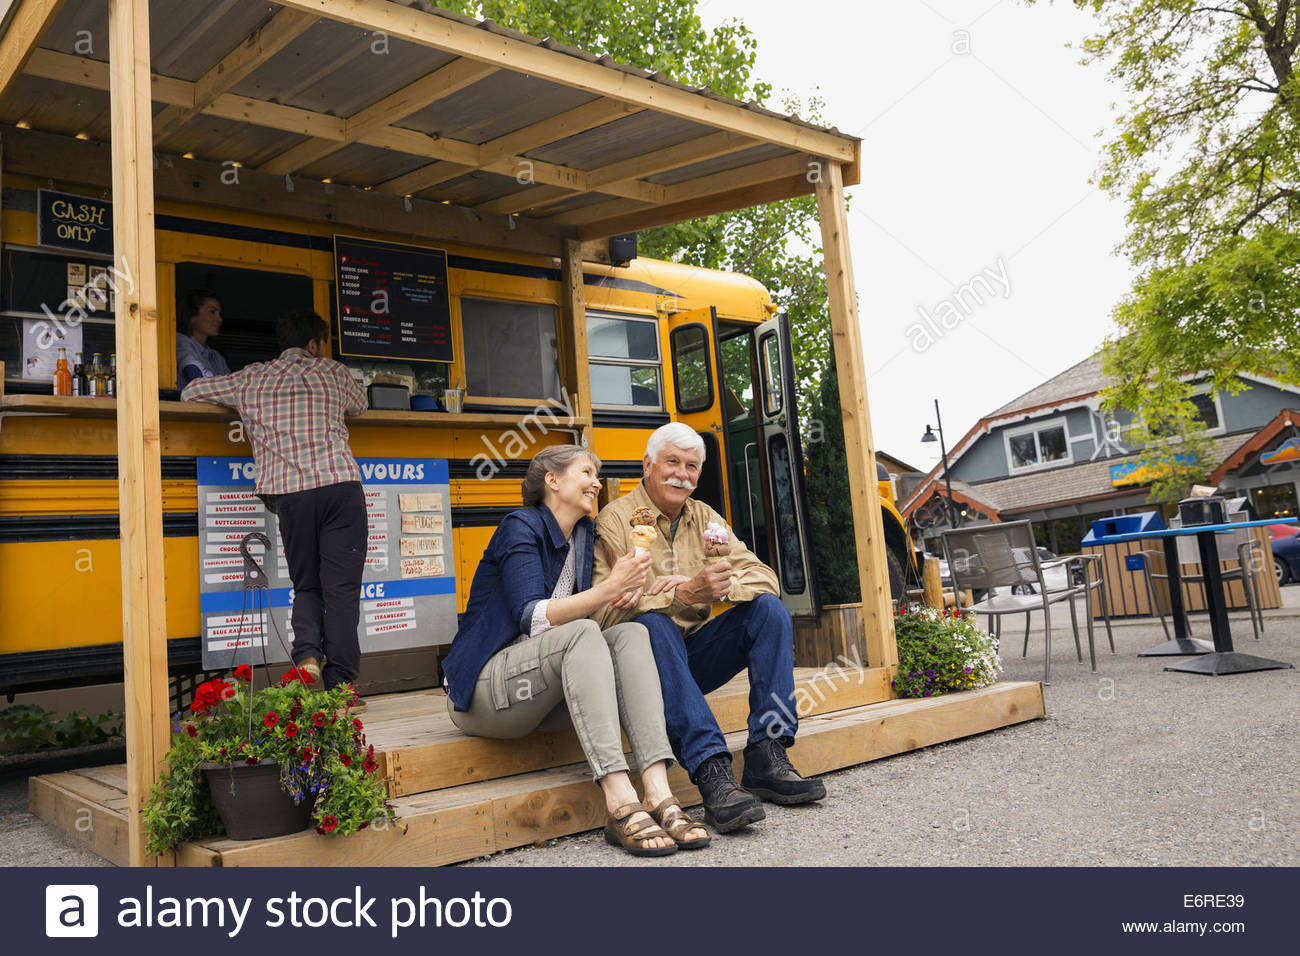 Älteres Ehepaar essen Eis bei Imbisswagen Stockbild